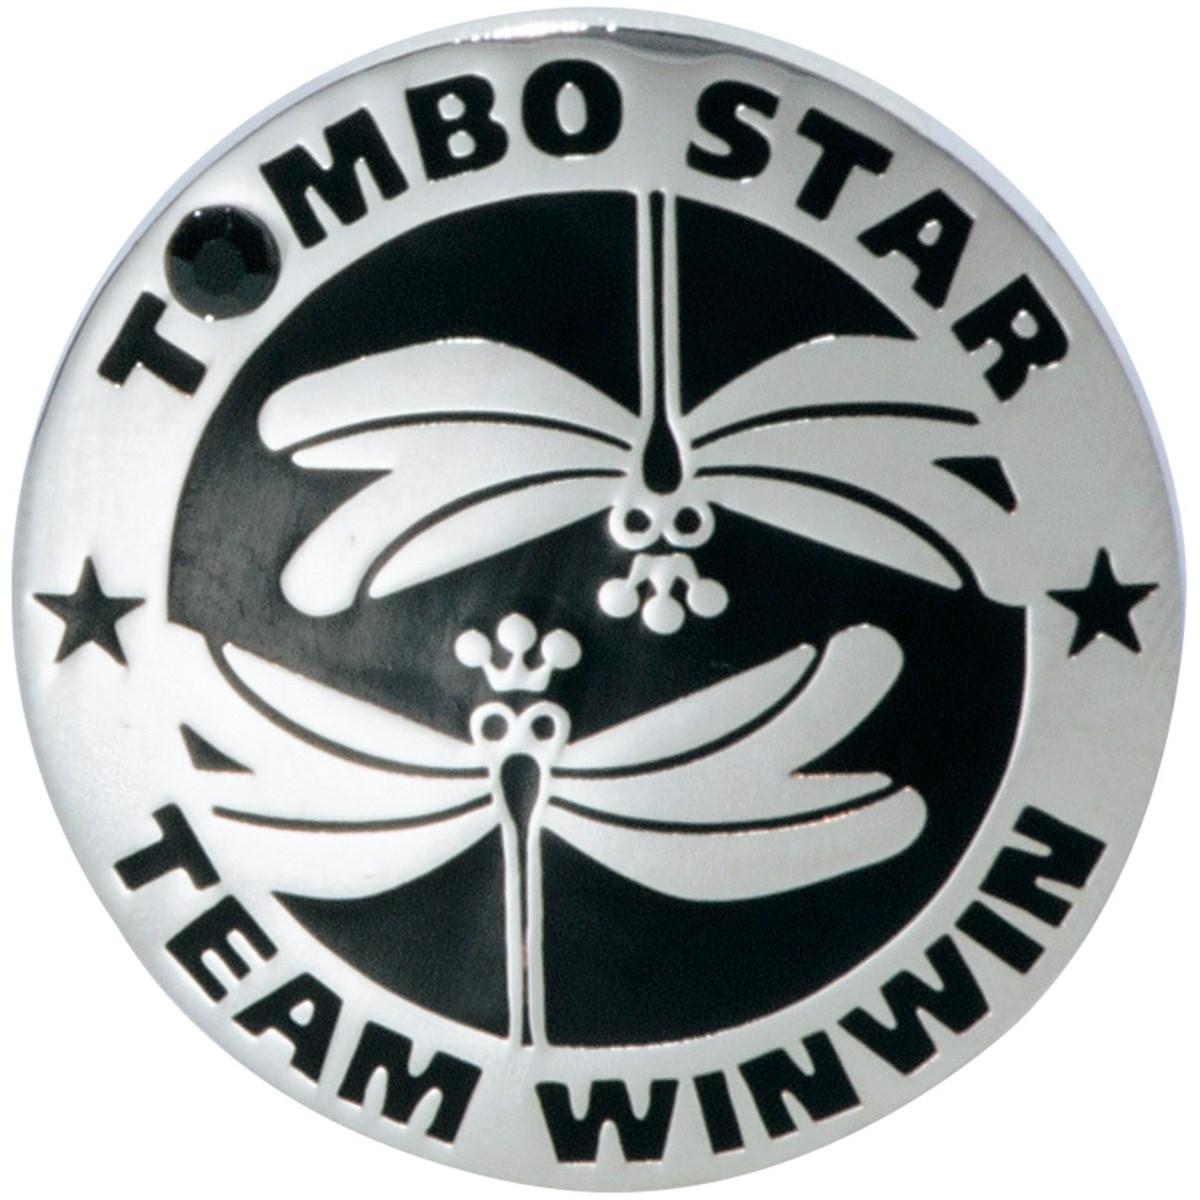 WINWIN STYLE TOMBO STAR マーカー